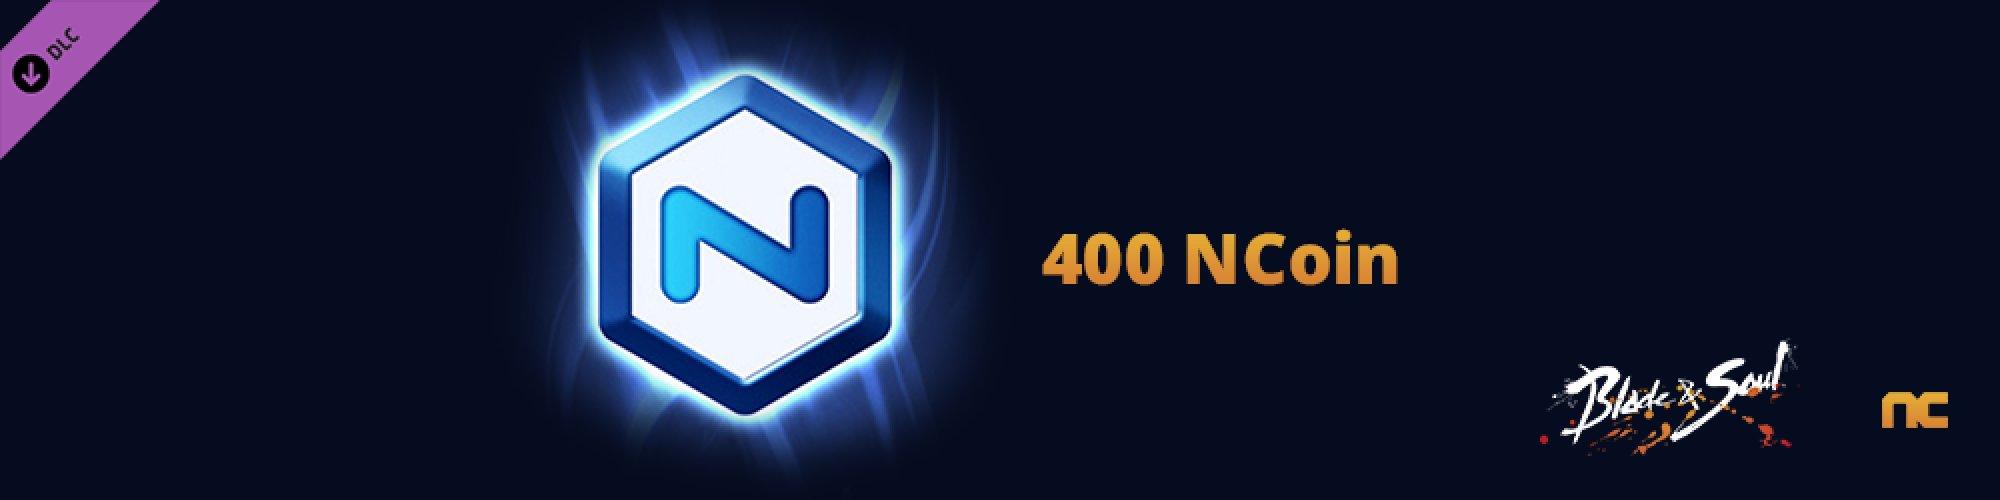 NCoin 400 banner